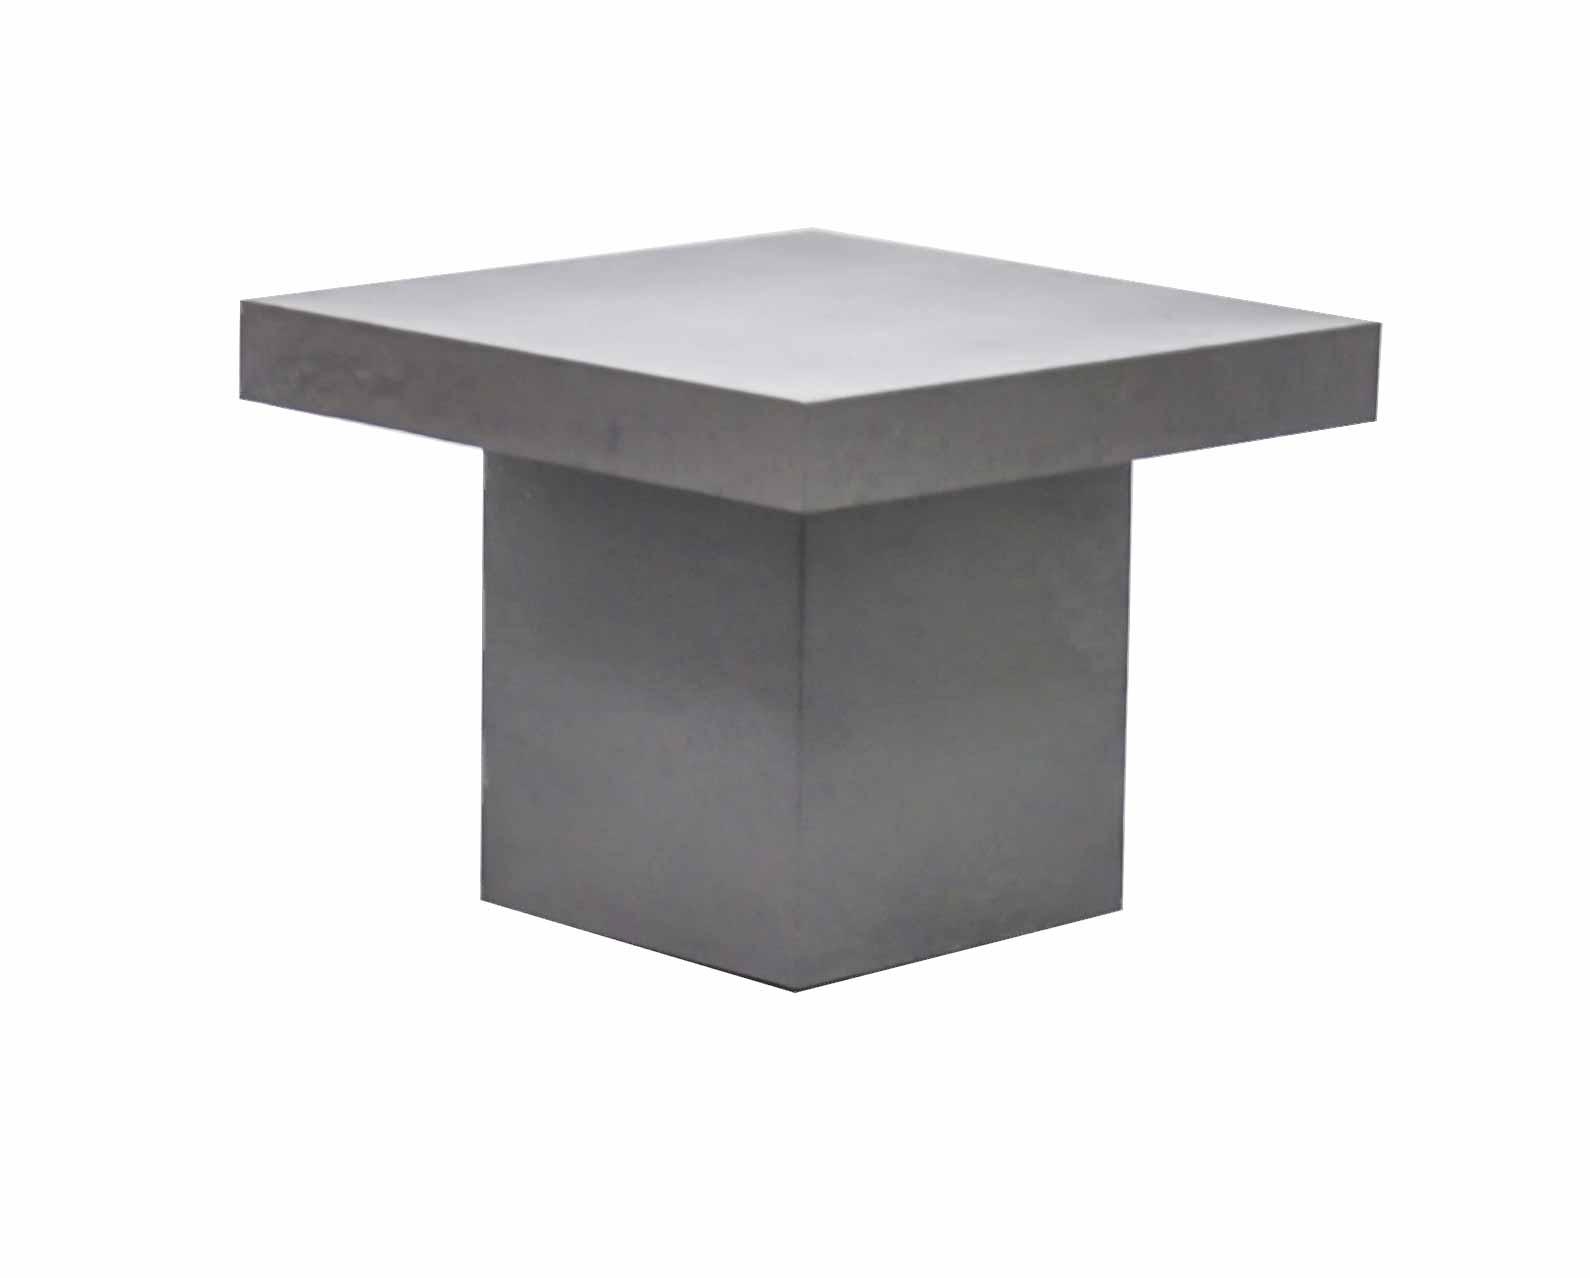 "ARI-23S 23"" Square End Table   23""x 23"" x 21"""